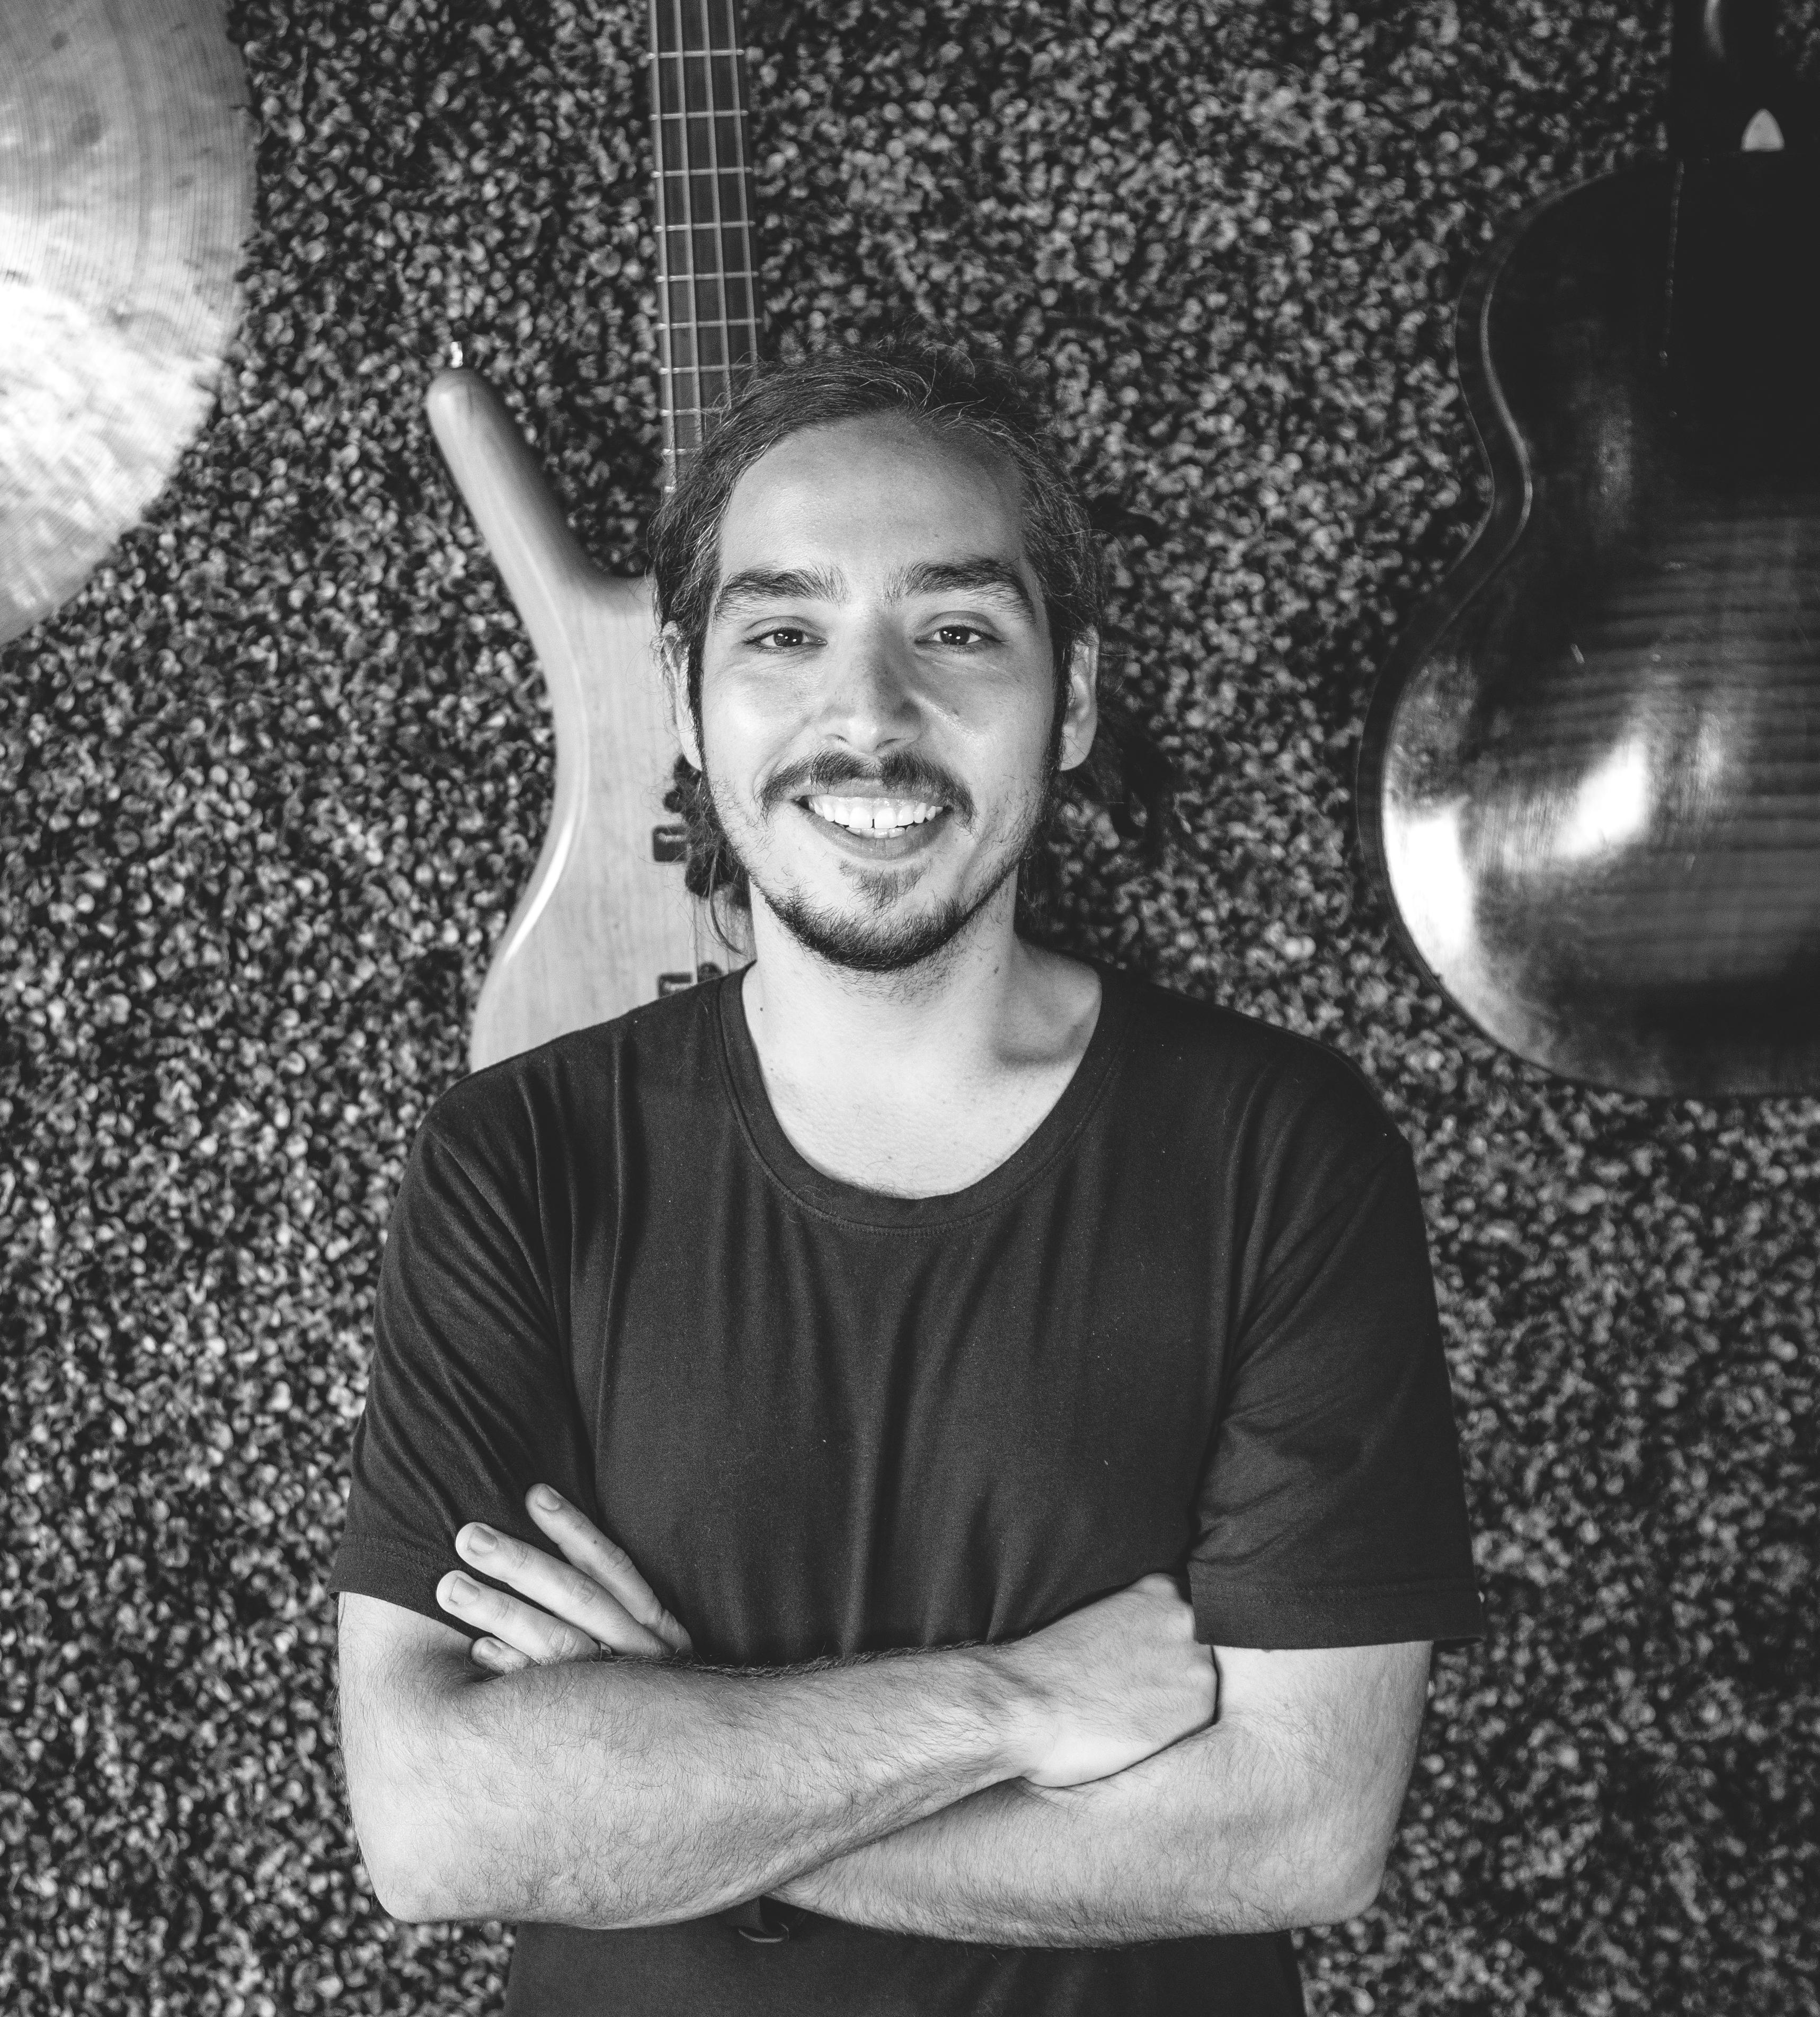 Image of Daniel Santrella